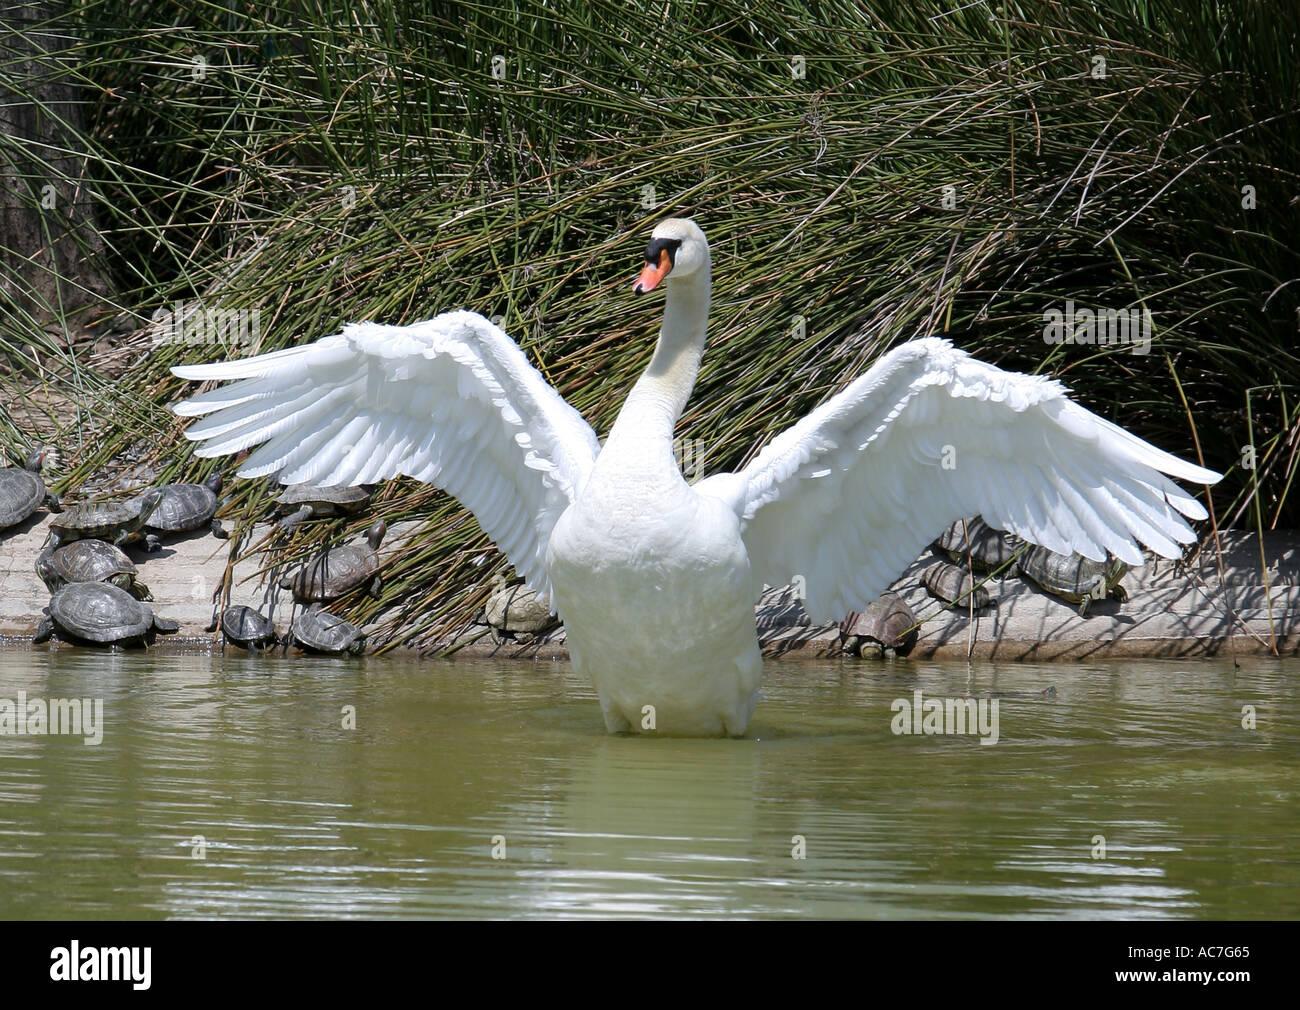 Swan Stretching